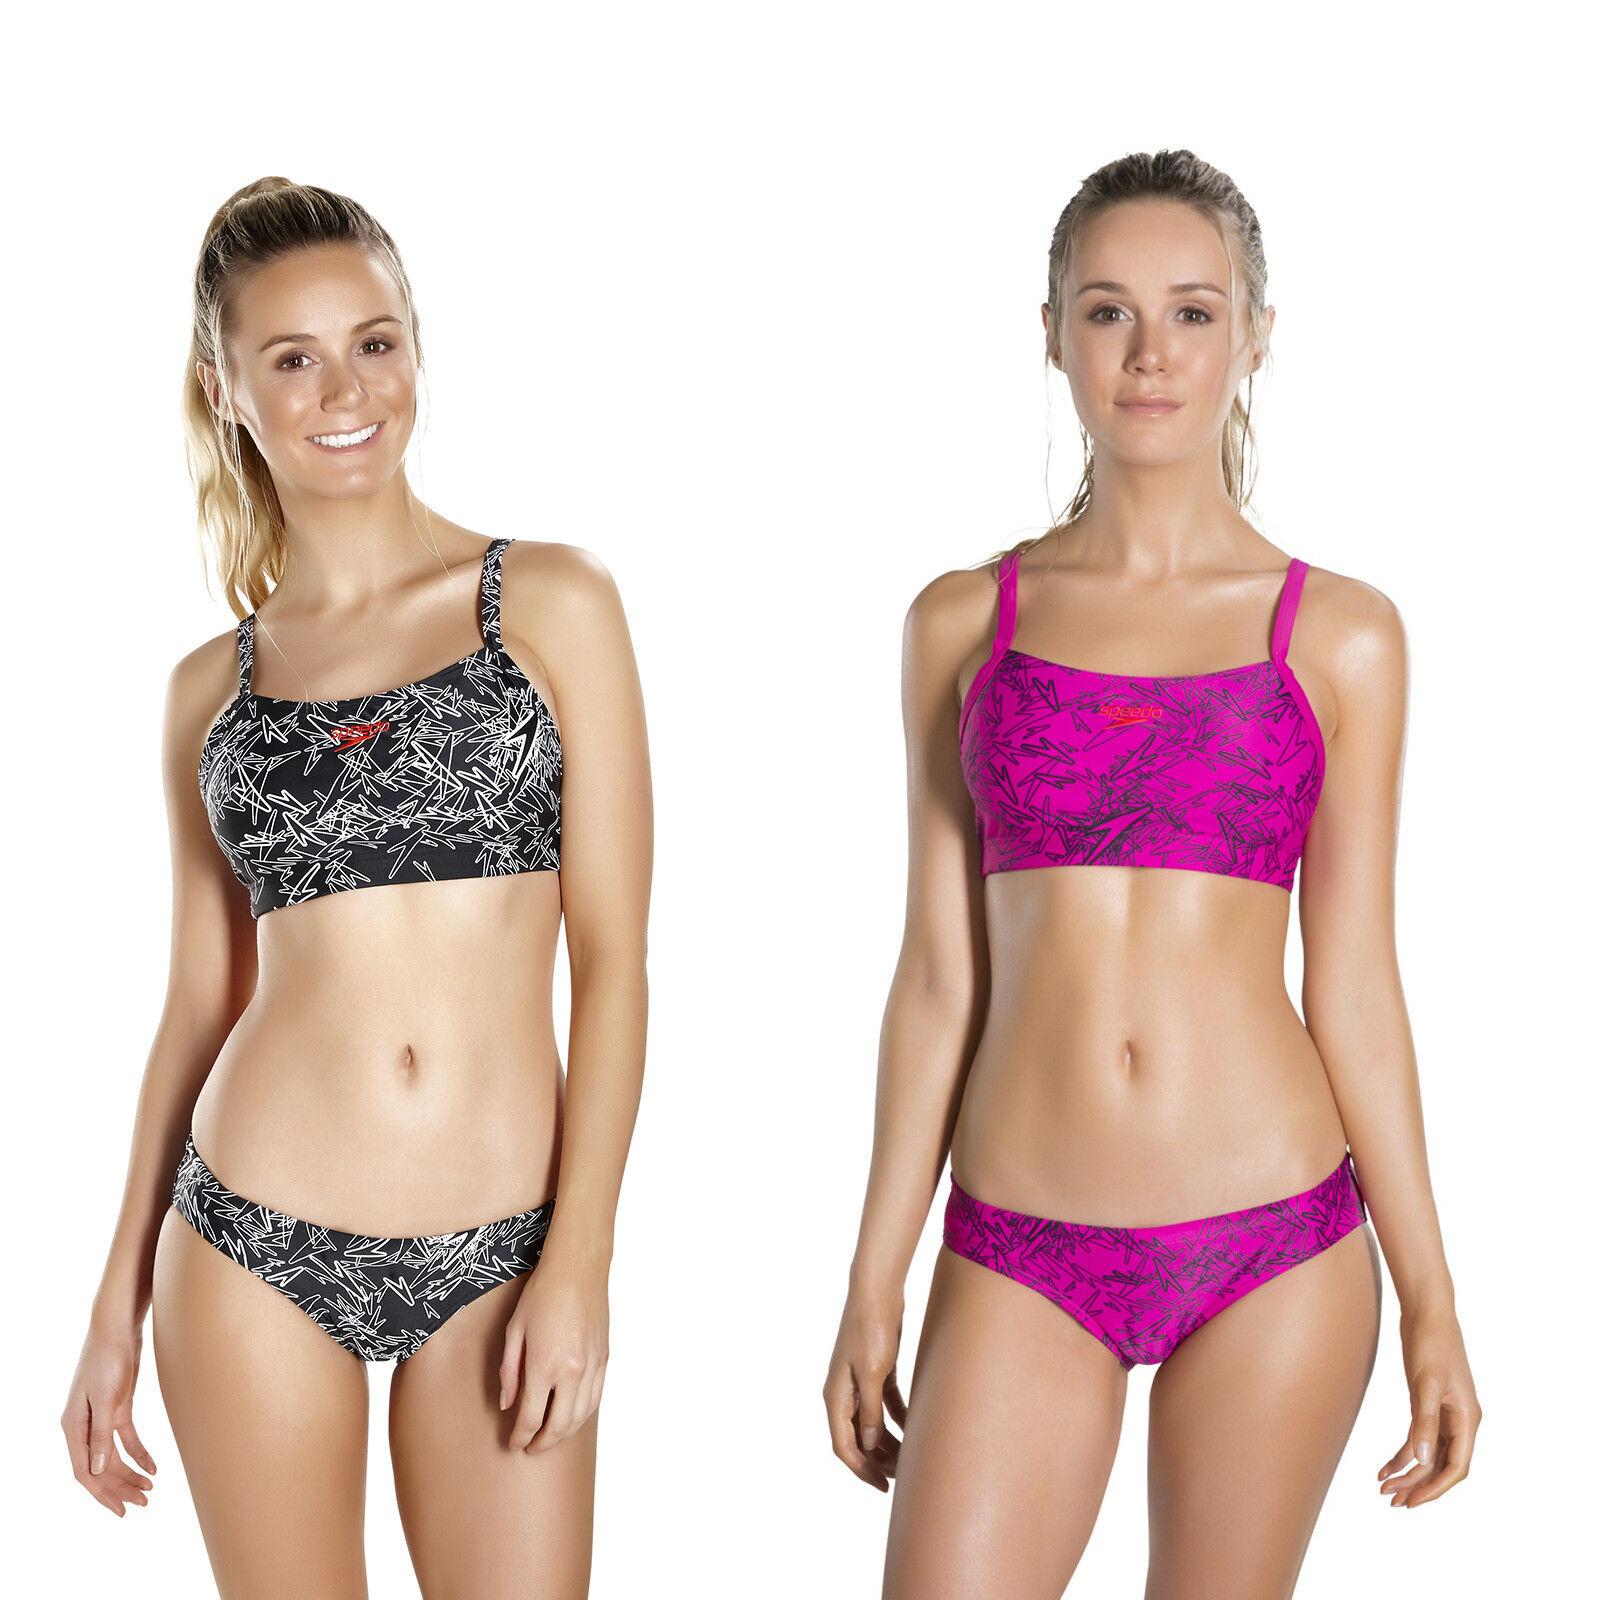 Bikini Speedo Damen Frauen Zweiteiler 2-Teiler Endurance 10 Badeanzug Bademode